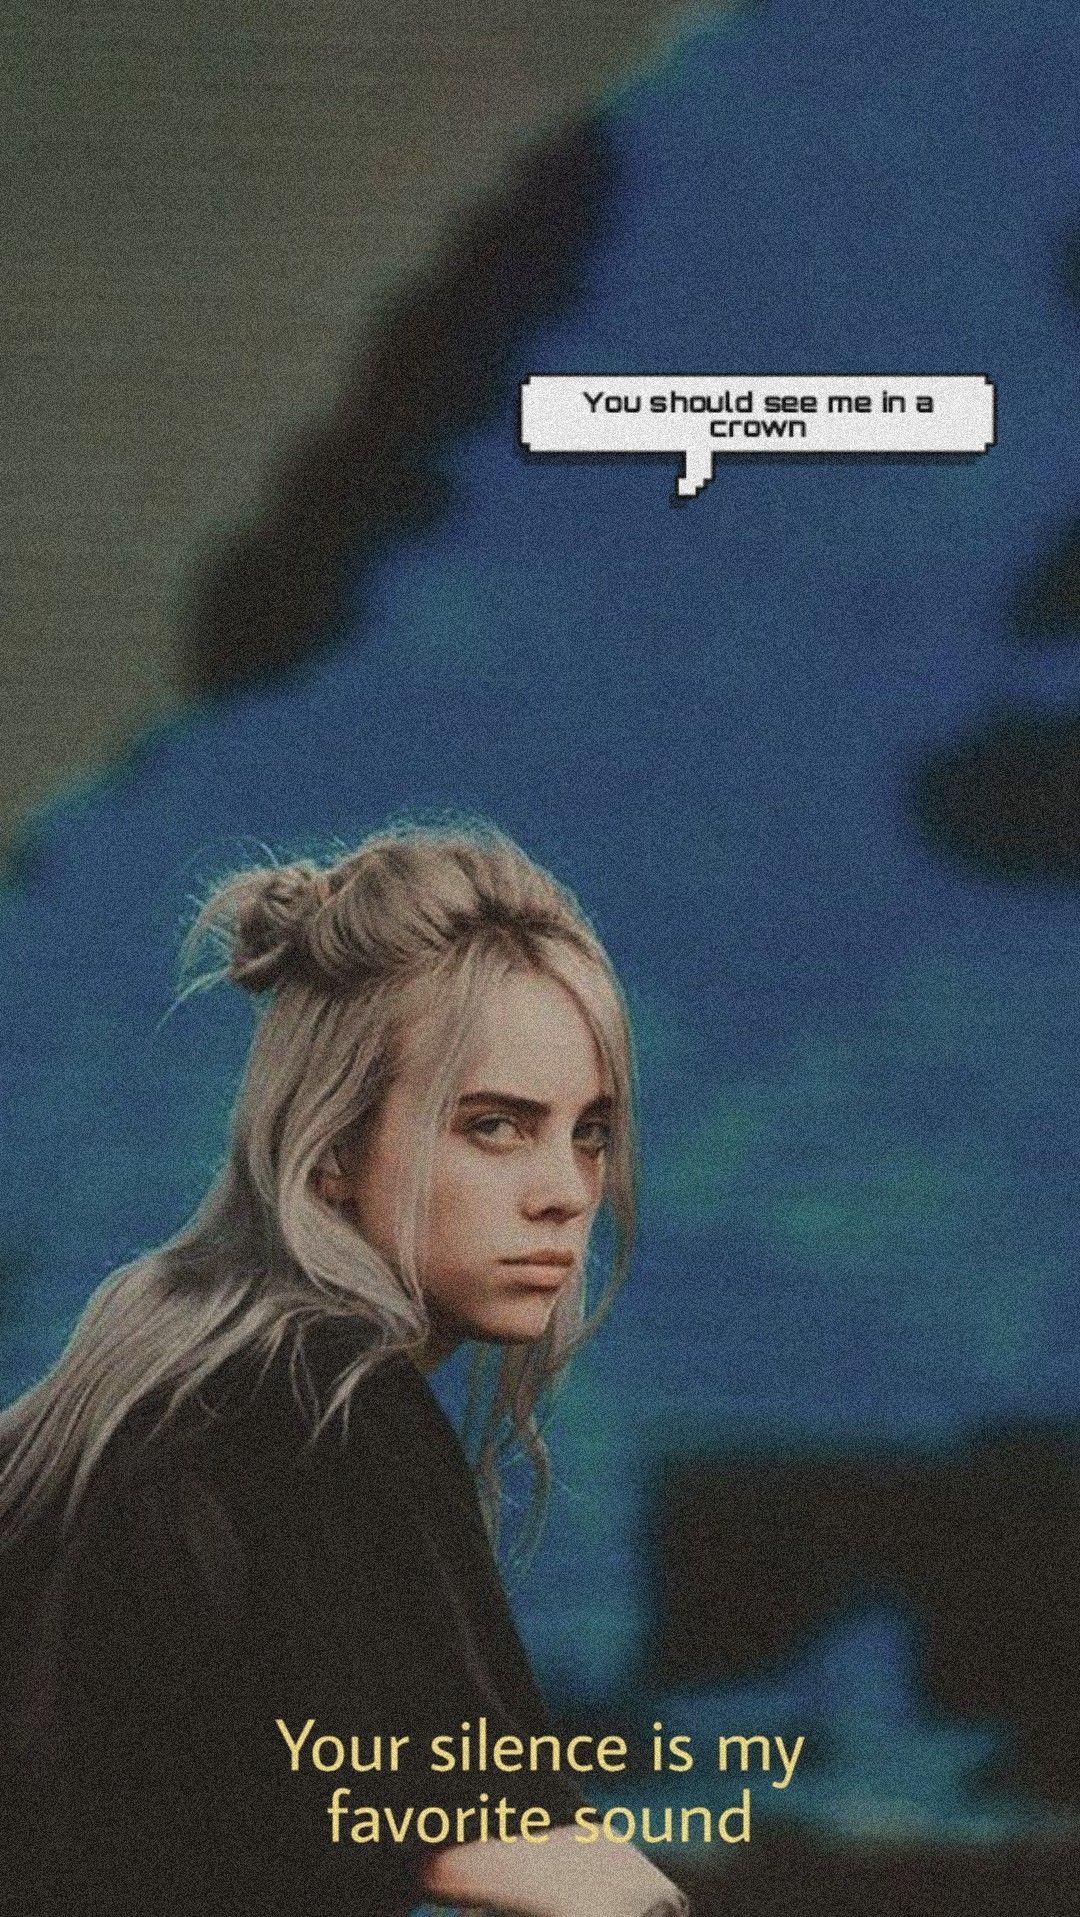 Billie Eilish You Should See Me In A Crown In 2020 Billie Eilish Billie Movie Posters